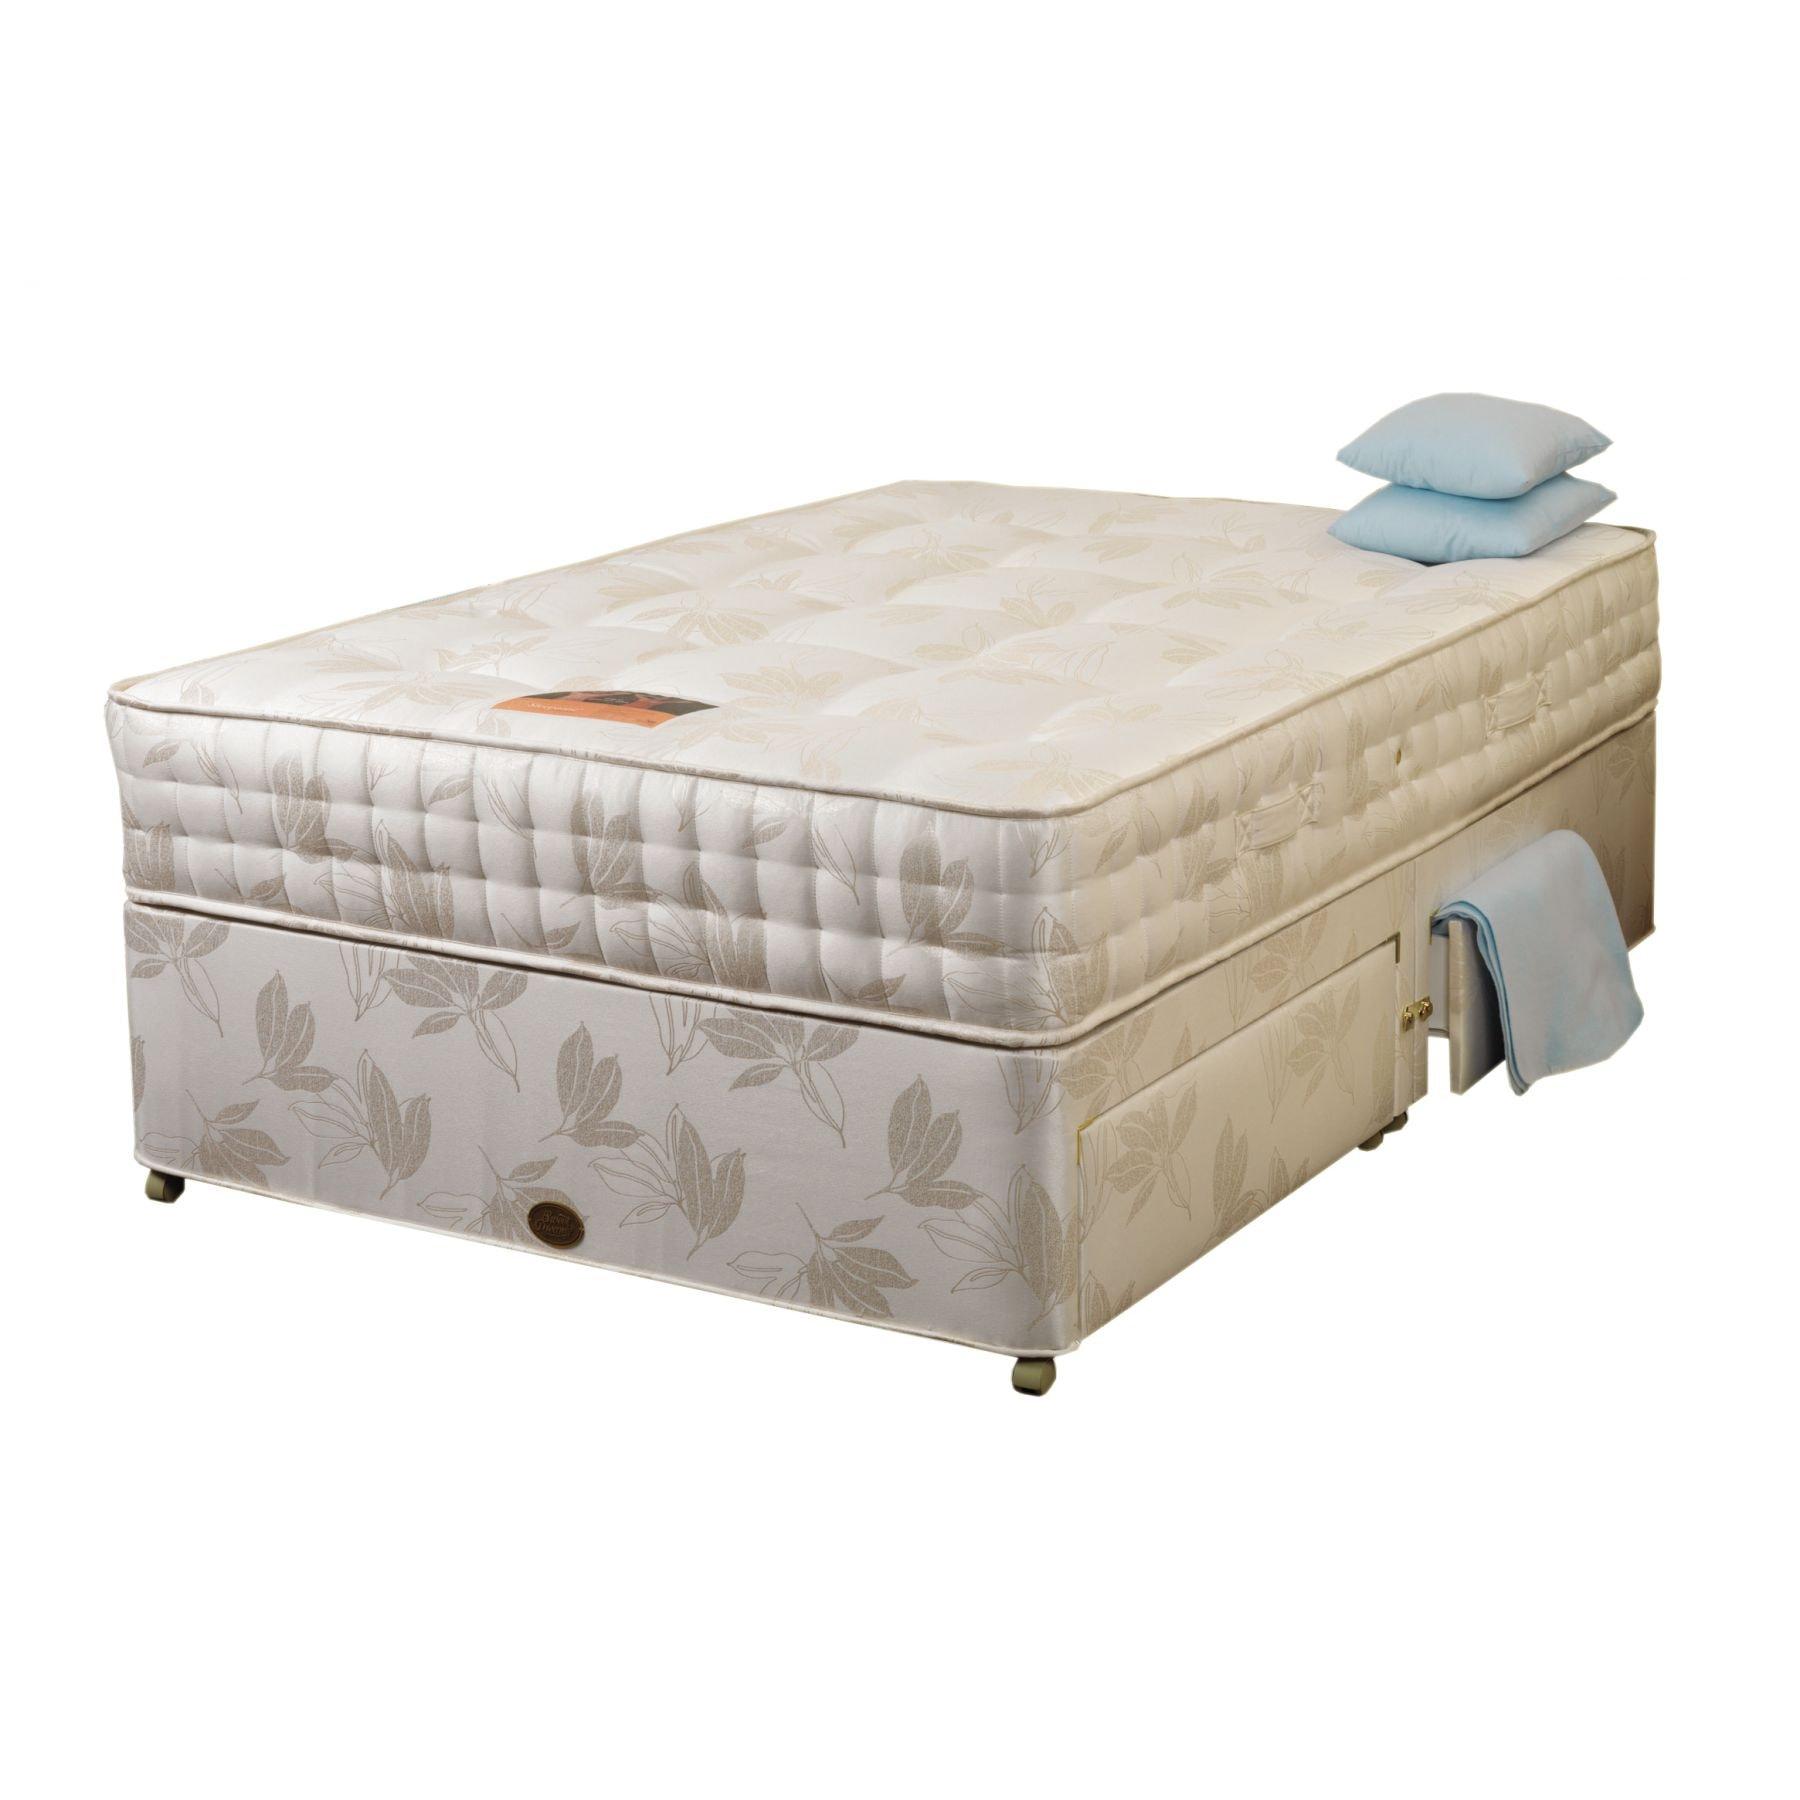 Masquerade divan base mattress for Divan base direct